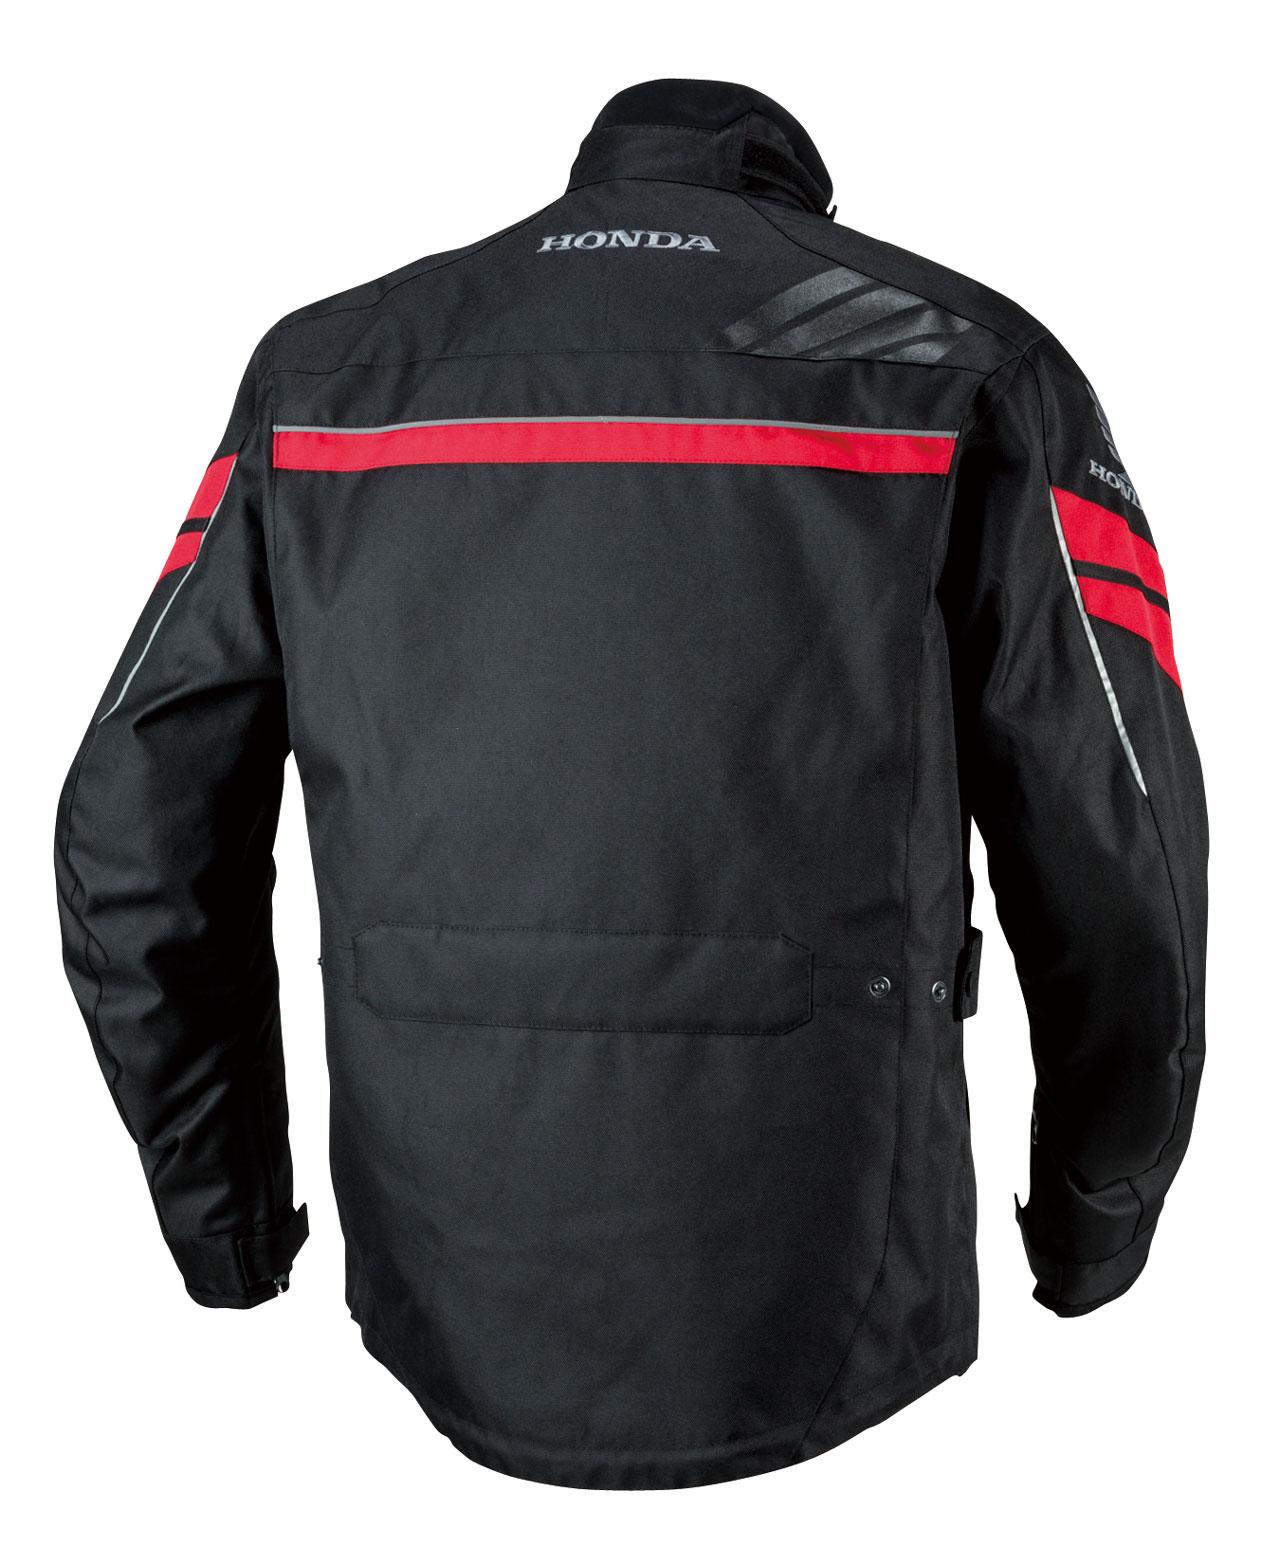 【HONDA RIDING GEAR】A/W冬季騎士外套 - 「Webike-摩托百貨」